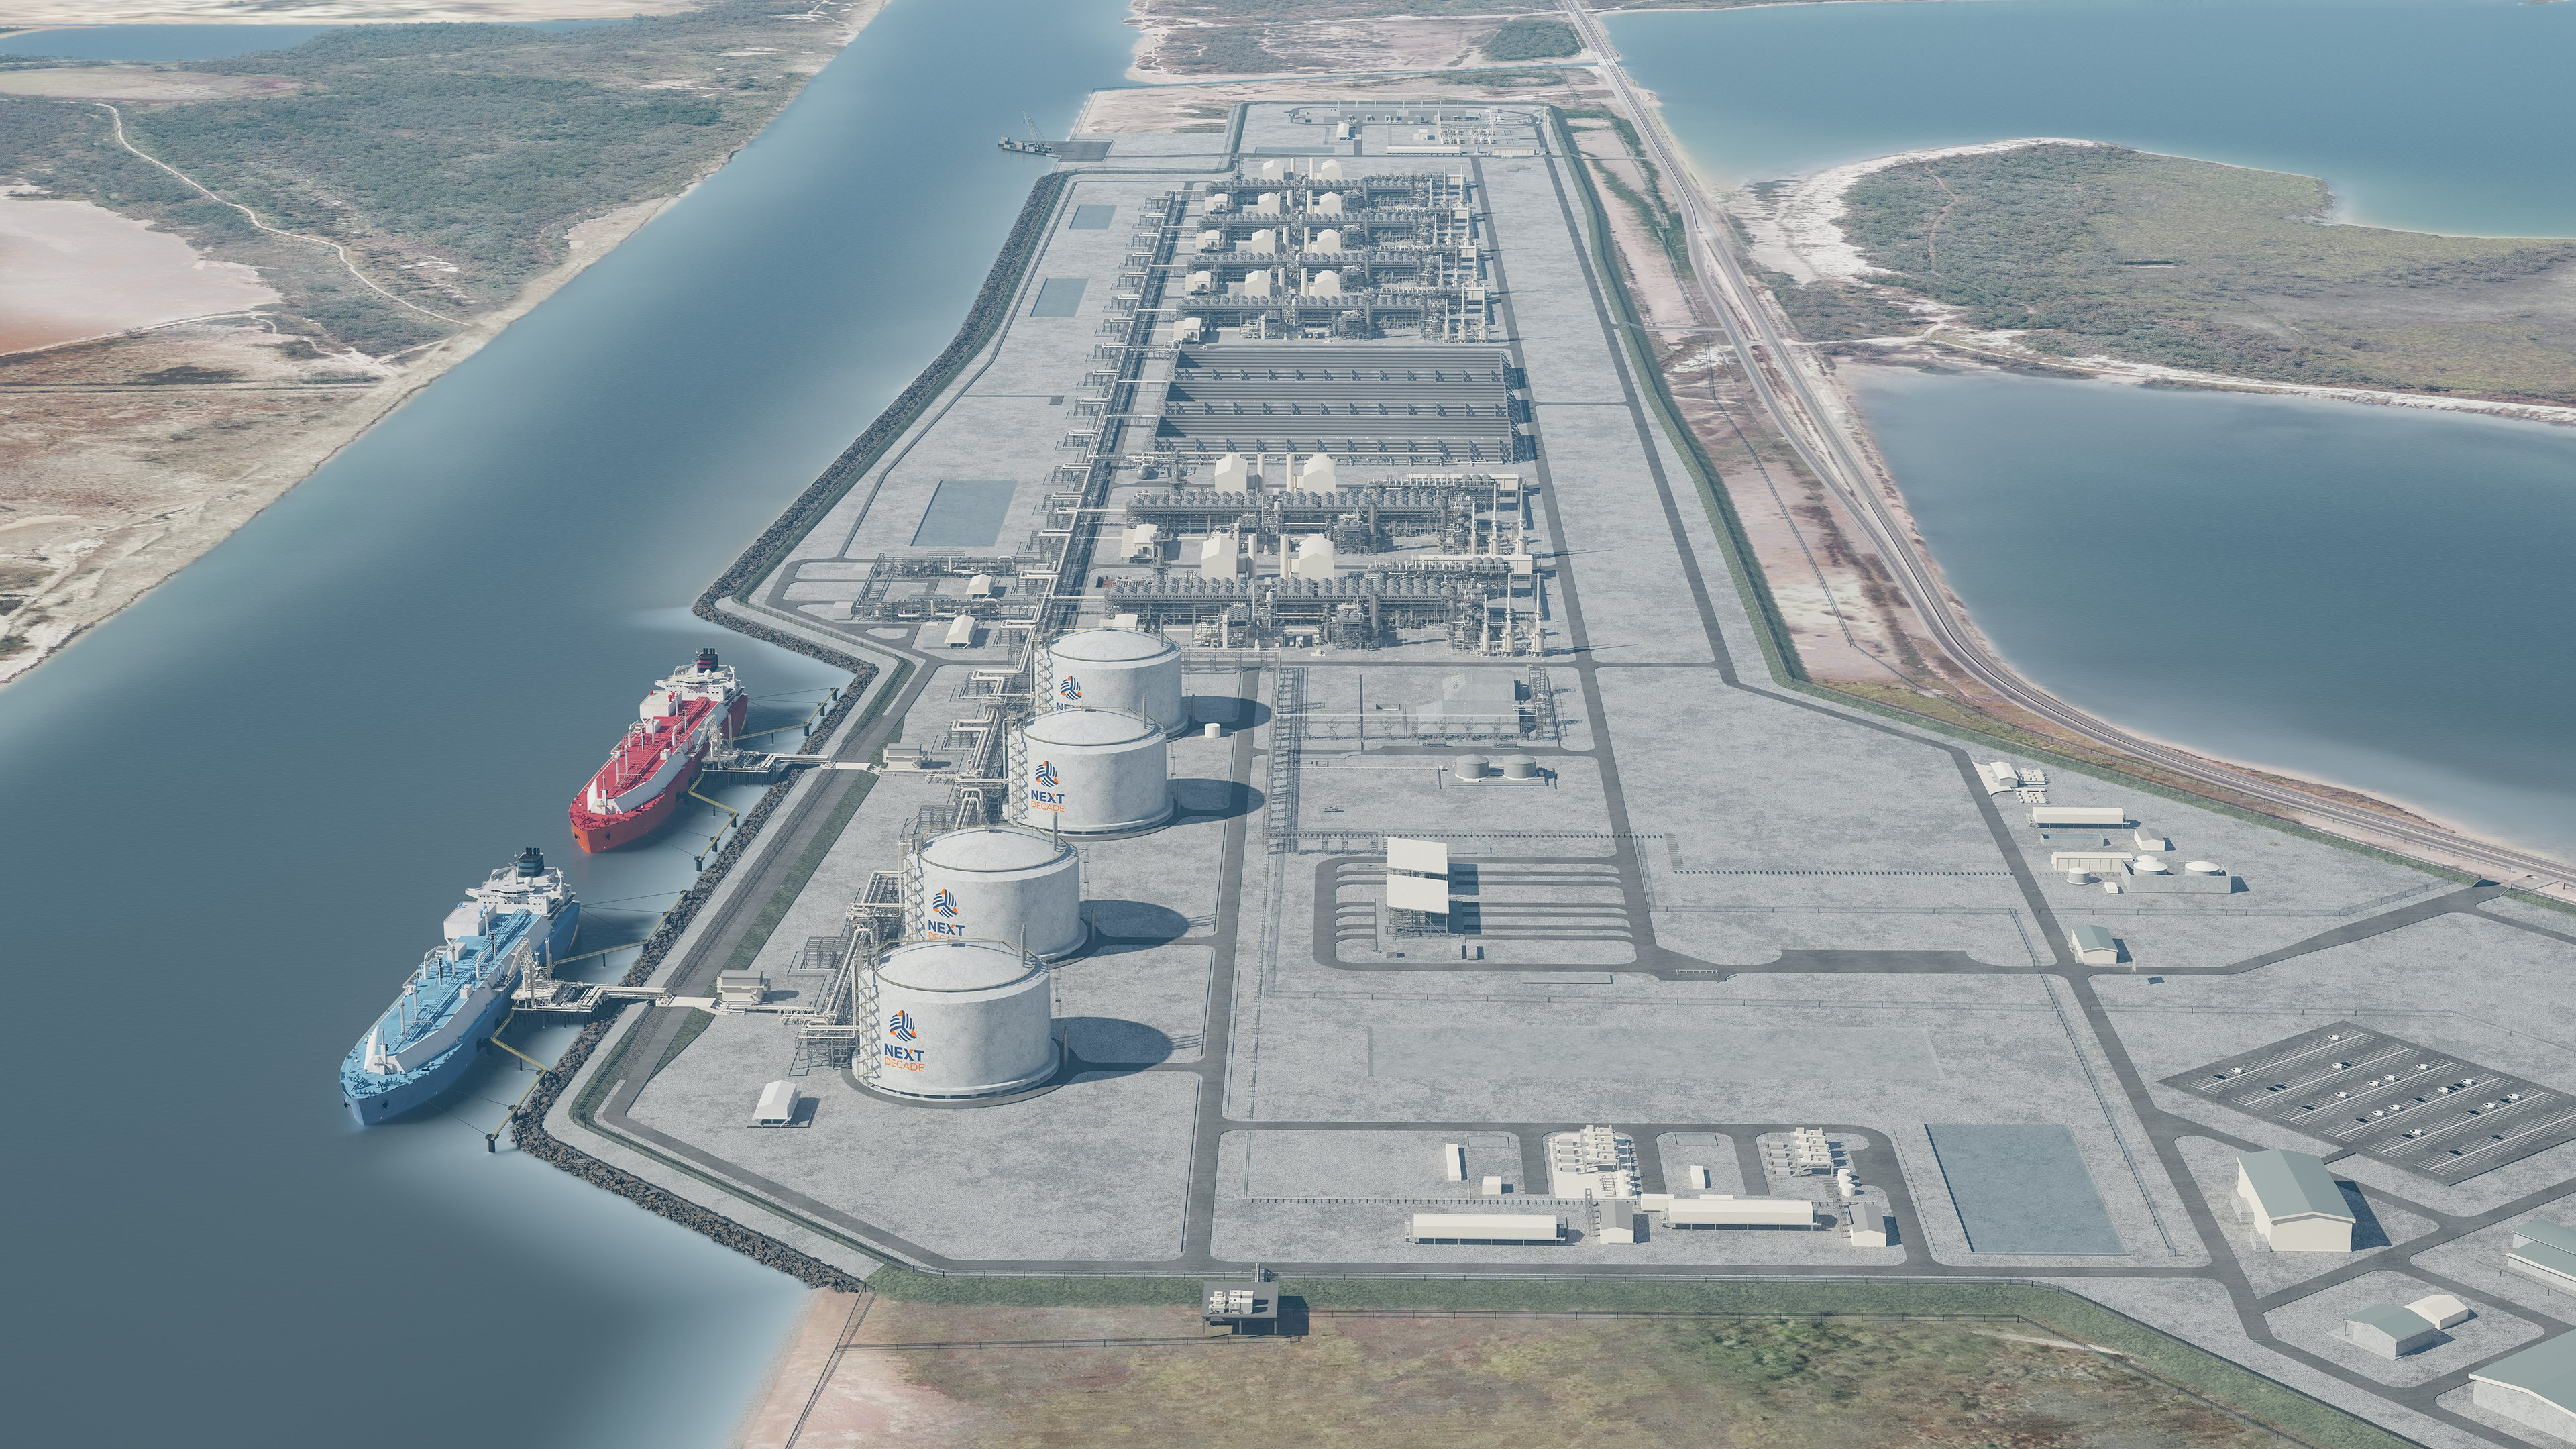 NextDecade, Bechtel extend Rio Grande EPC deal validity